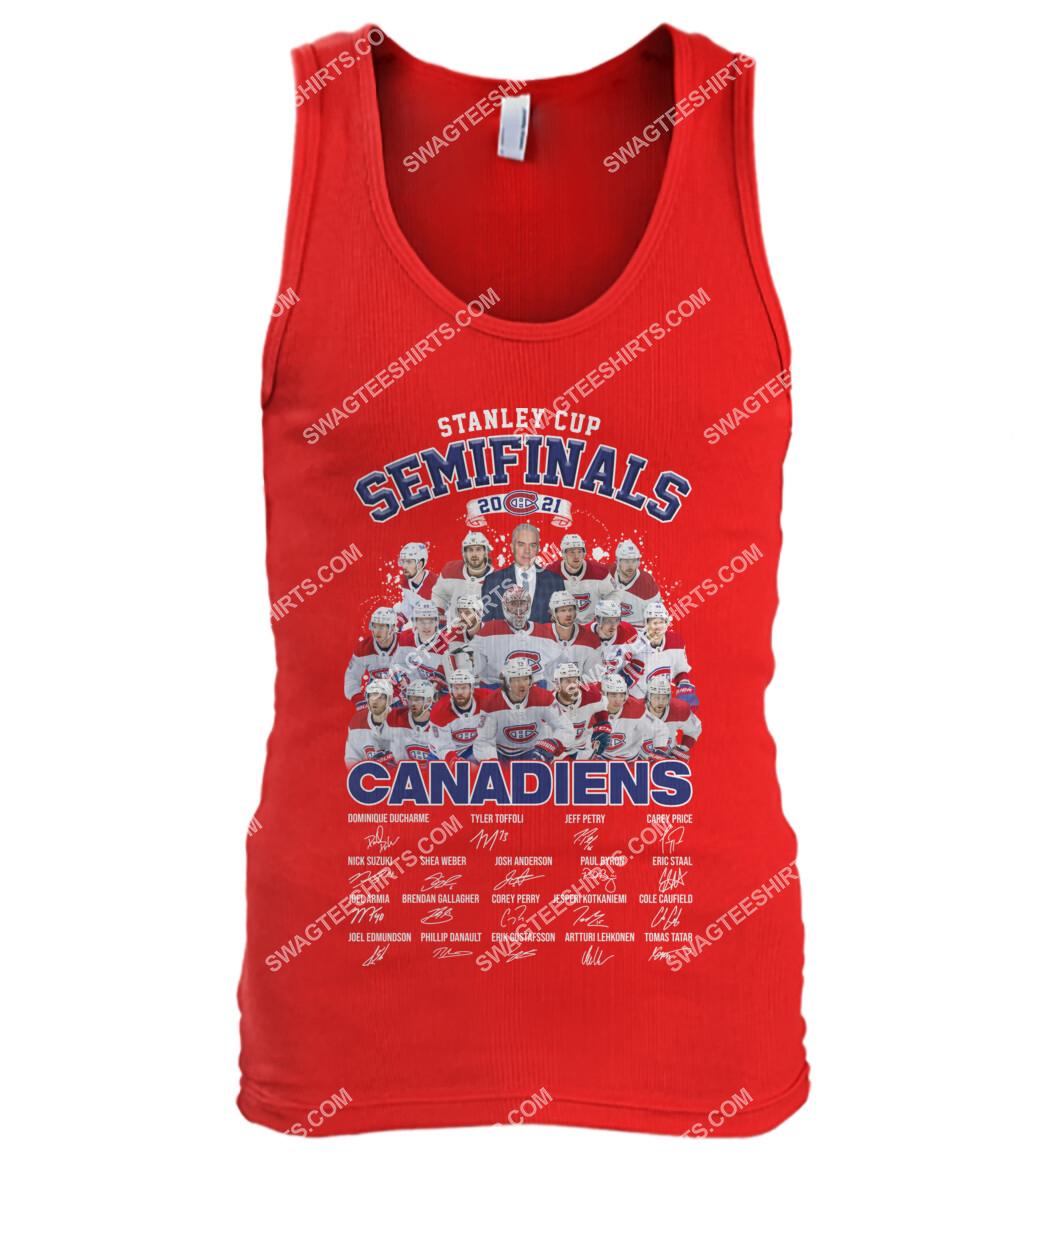 astanley cup semifinals 2021 montreal canadiens signatures tank top 1